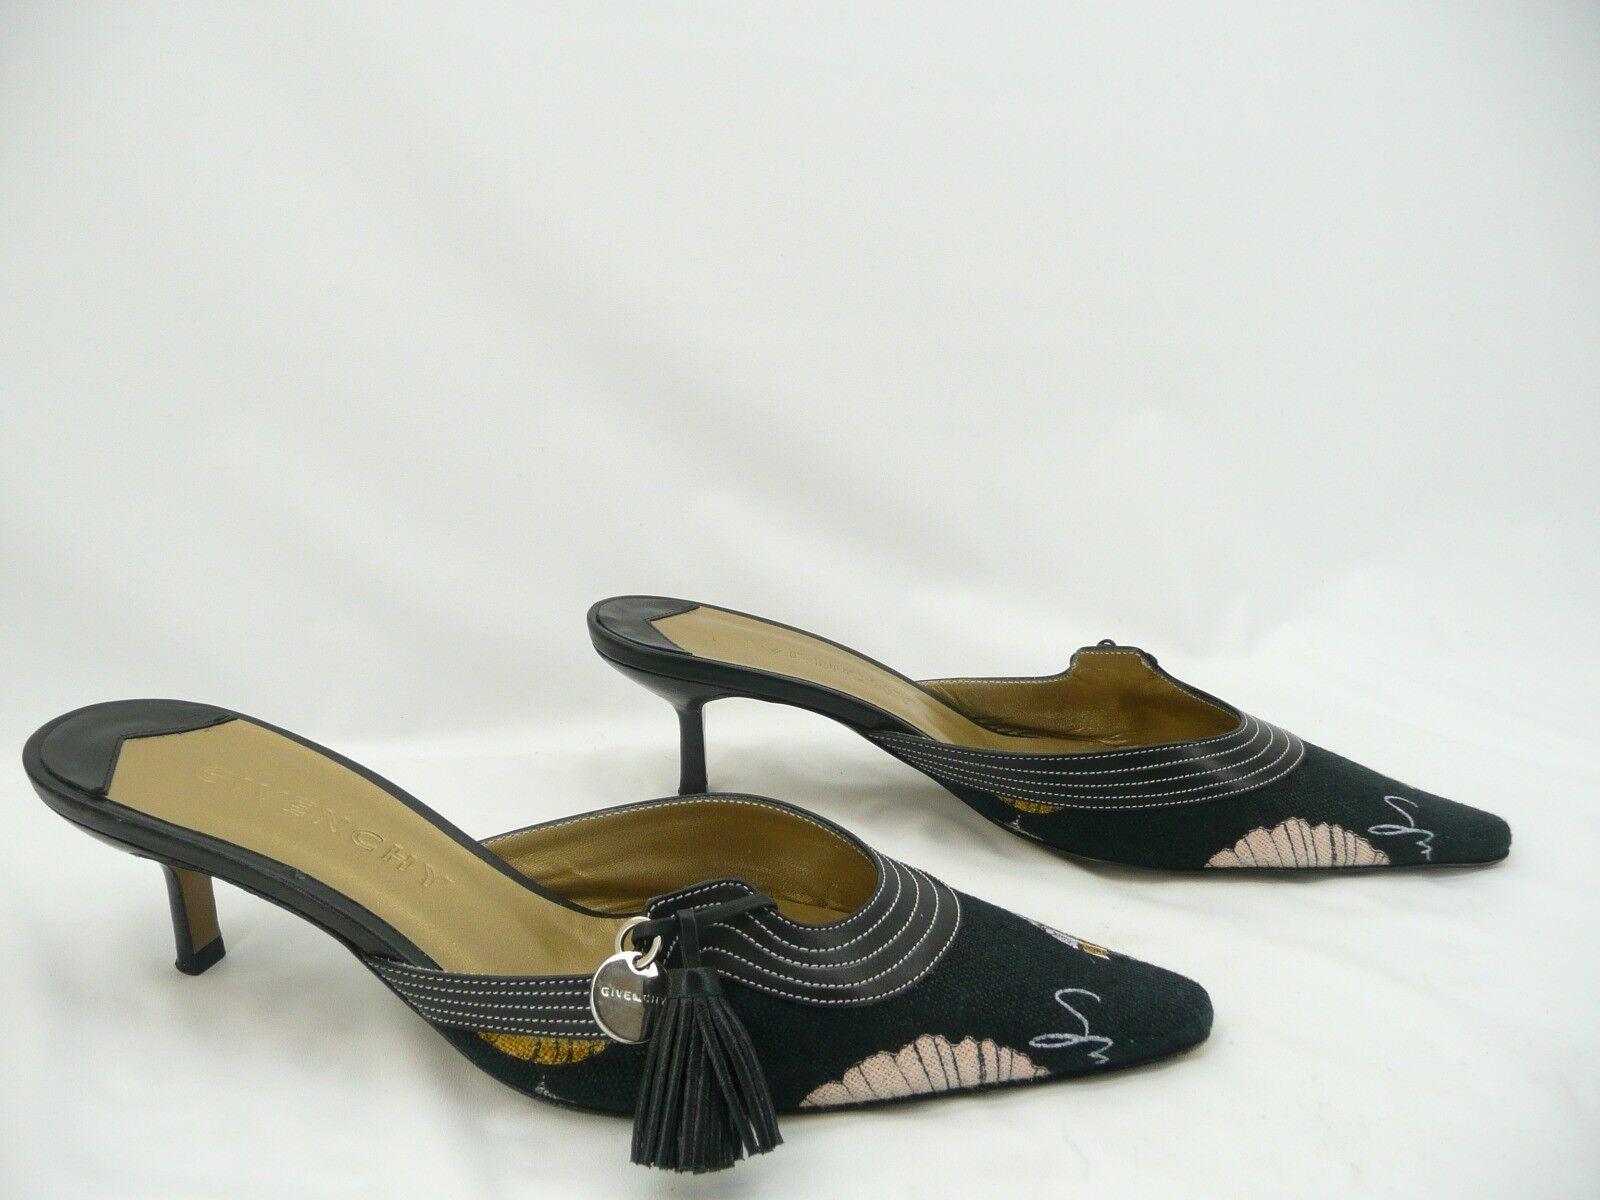 Givenchy läder  Fabric Print Kitten klackar Slides skor Sz 37   7